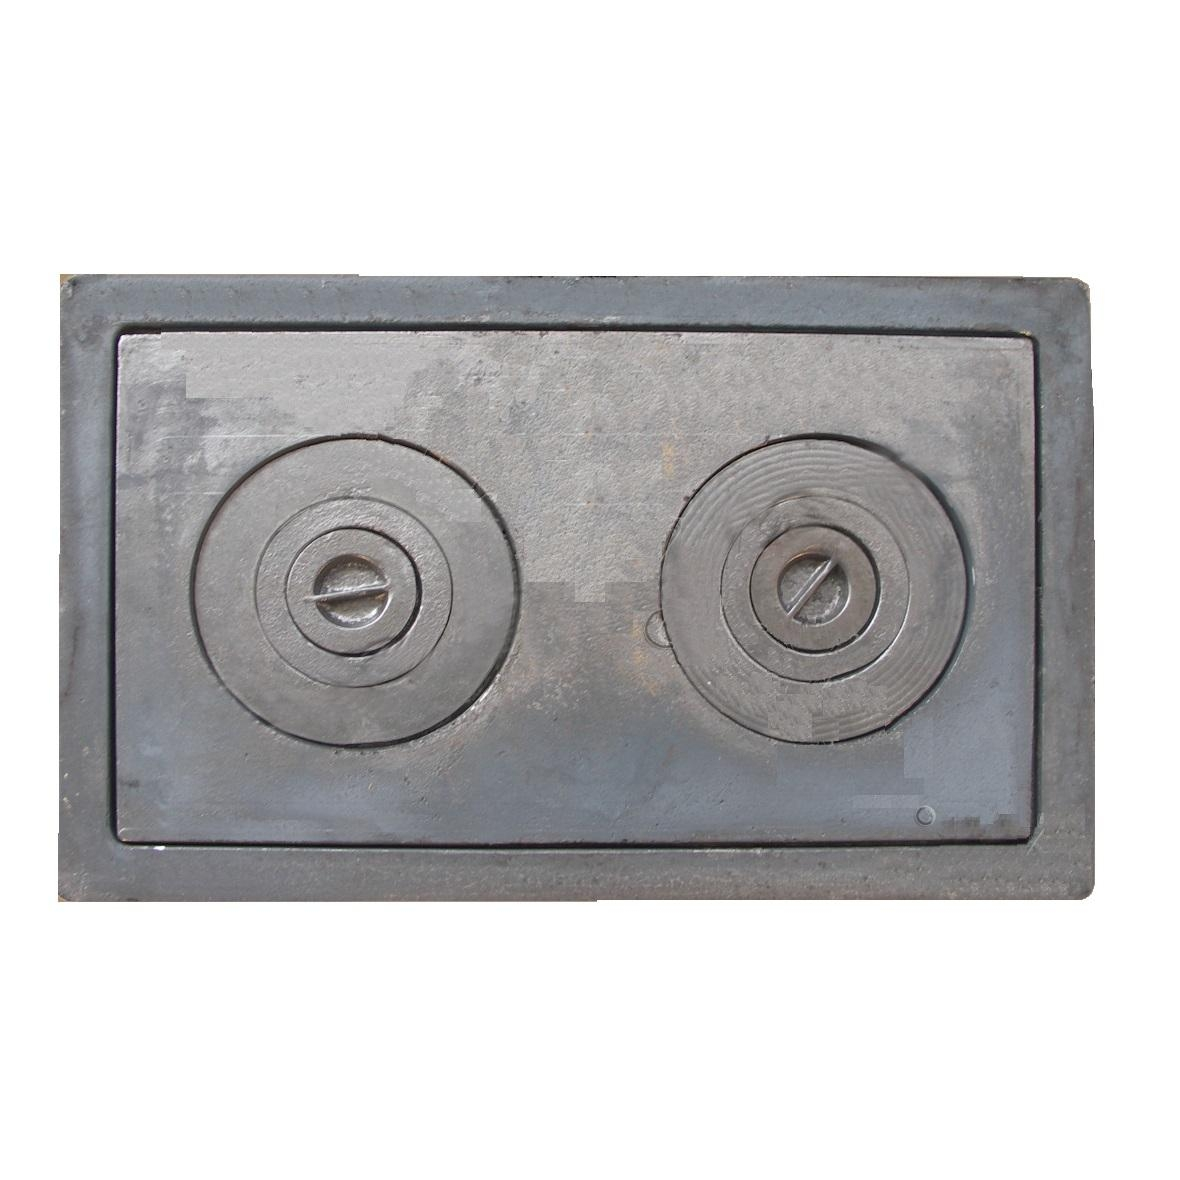 Чугунная плита для печи: виды, характеристики, установка и эксплуатация